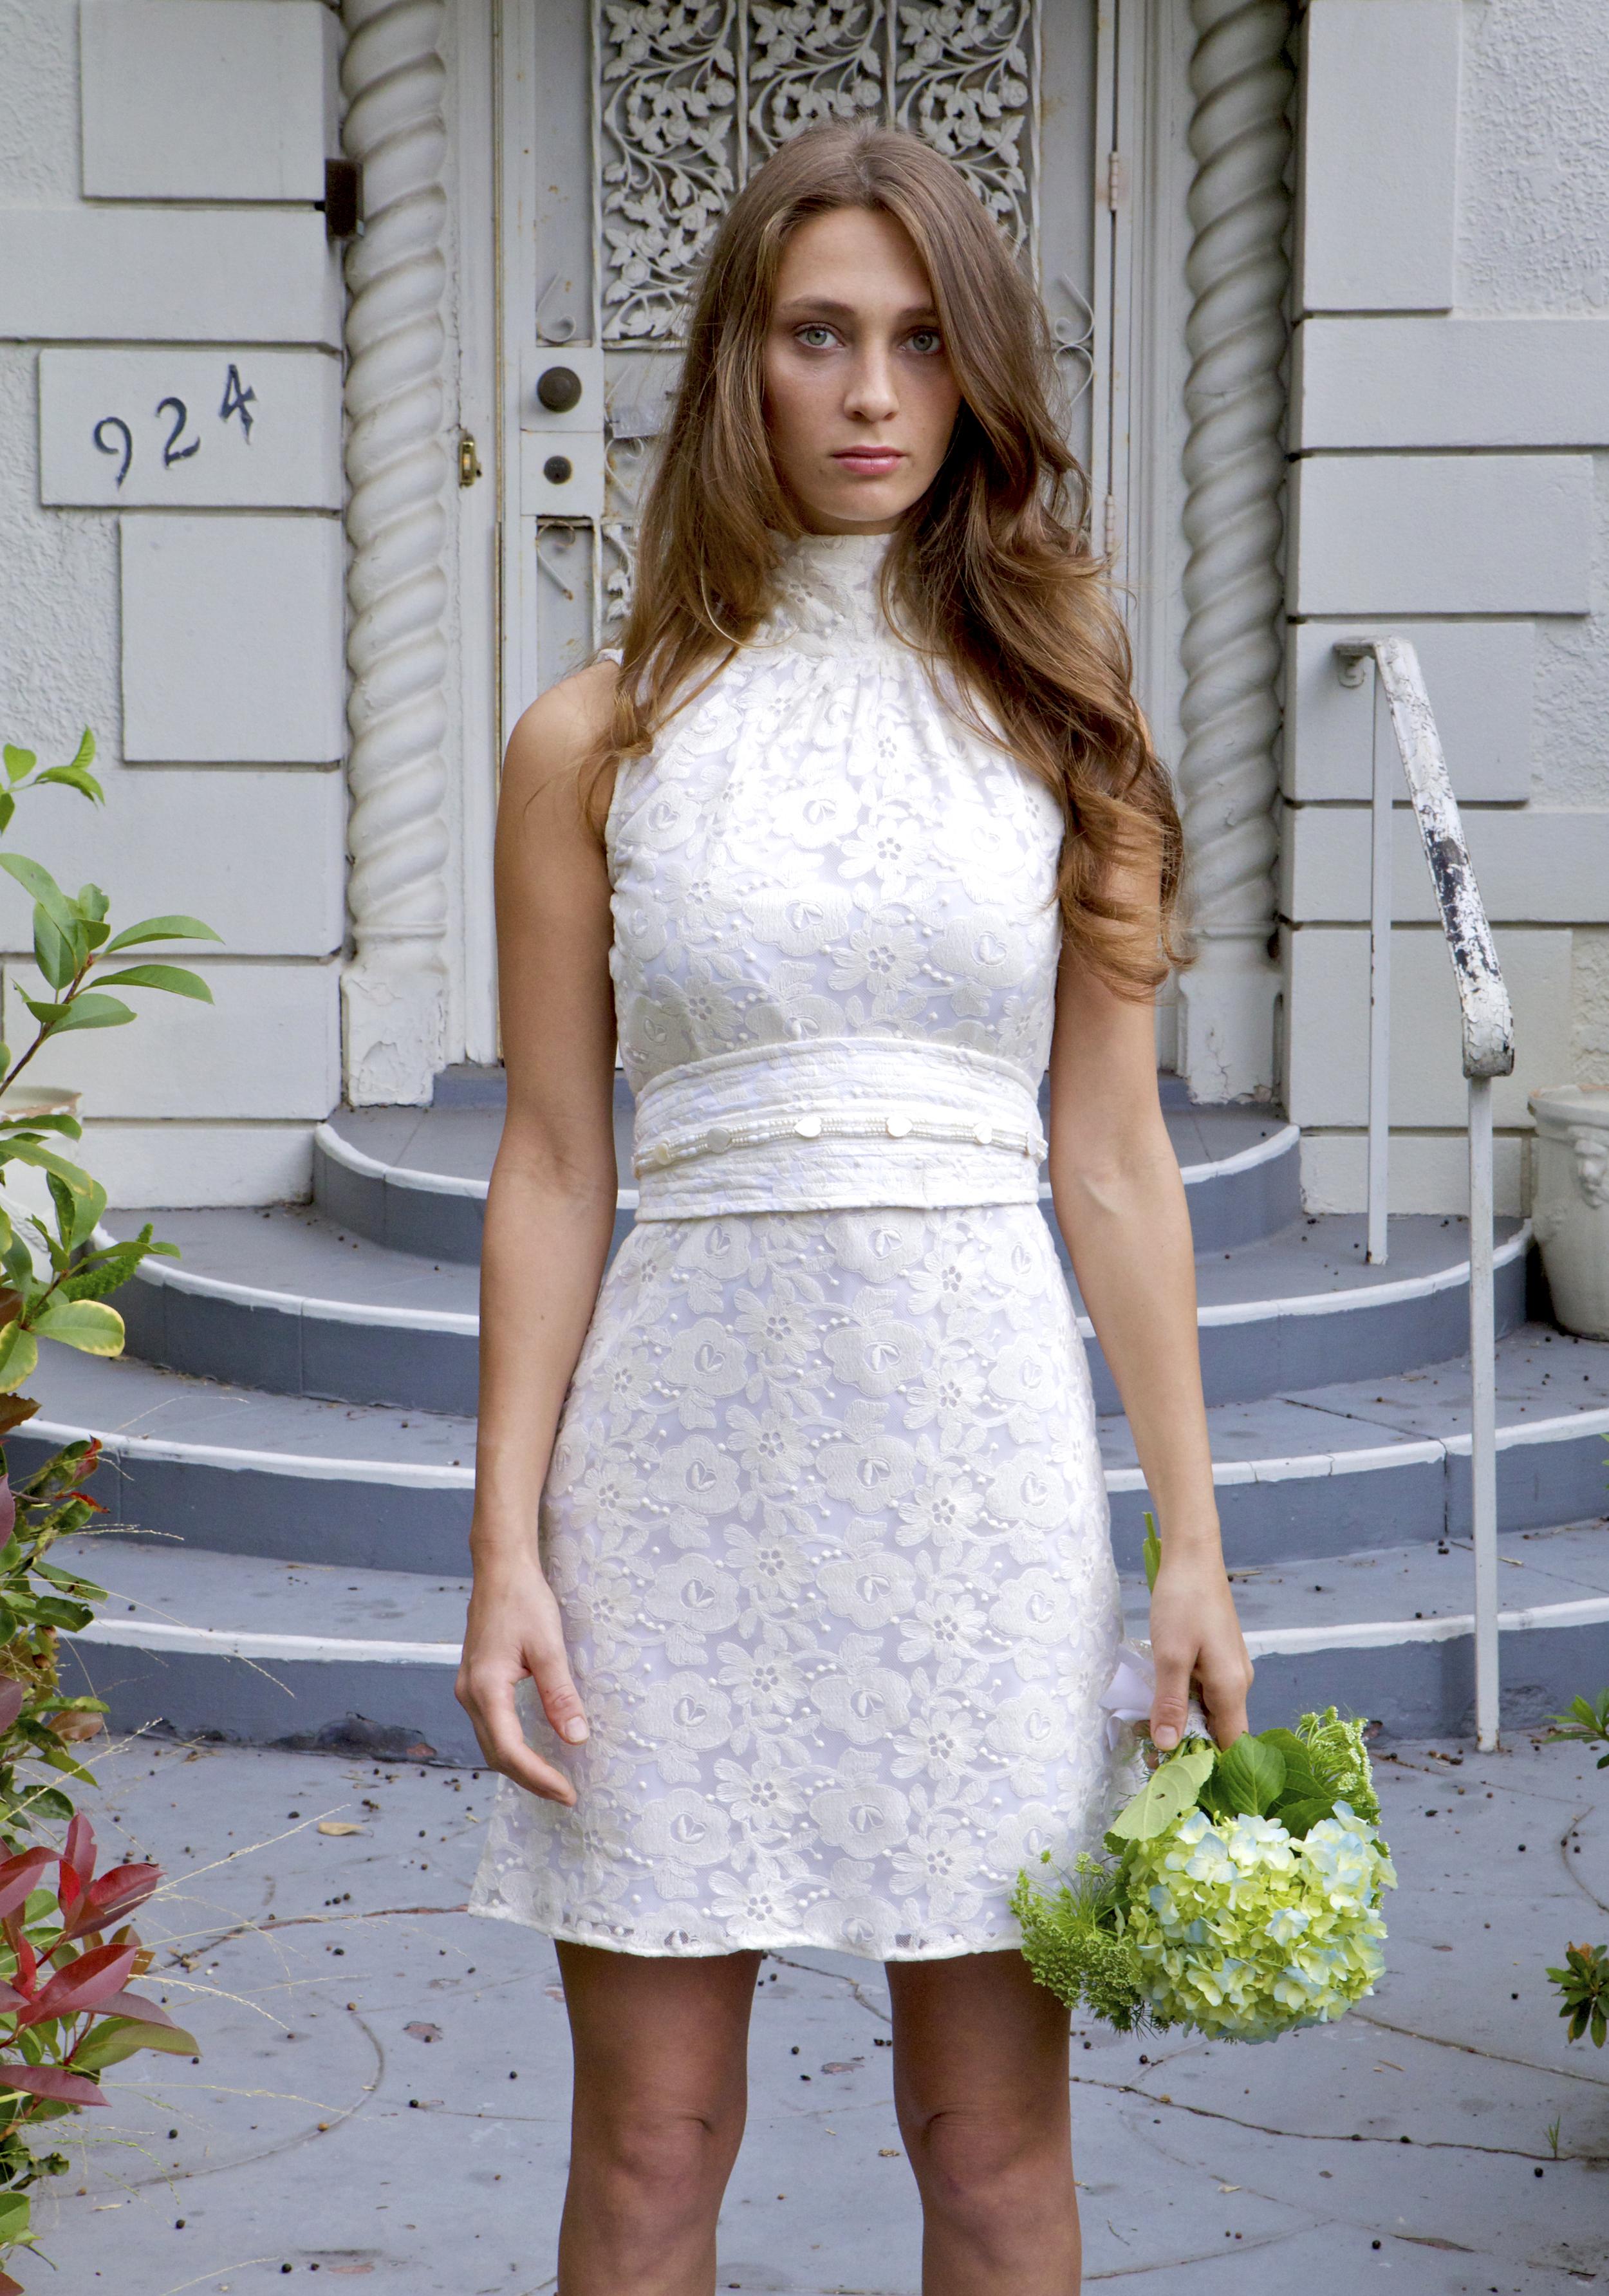 Lace Bridal mini dress with beaded obi belt.